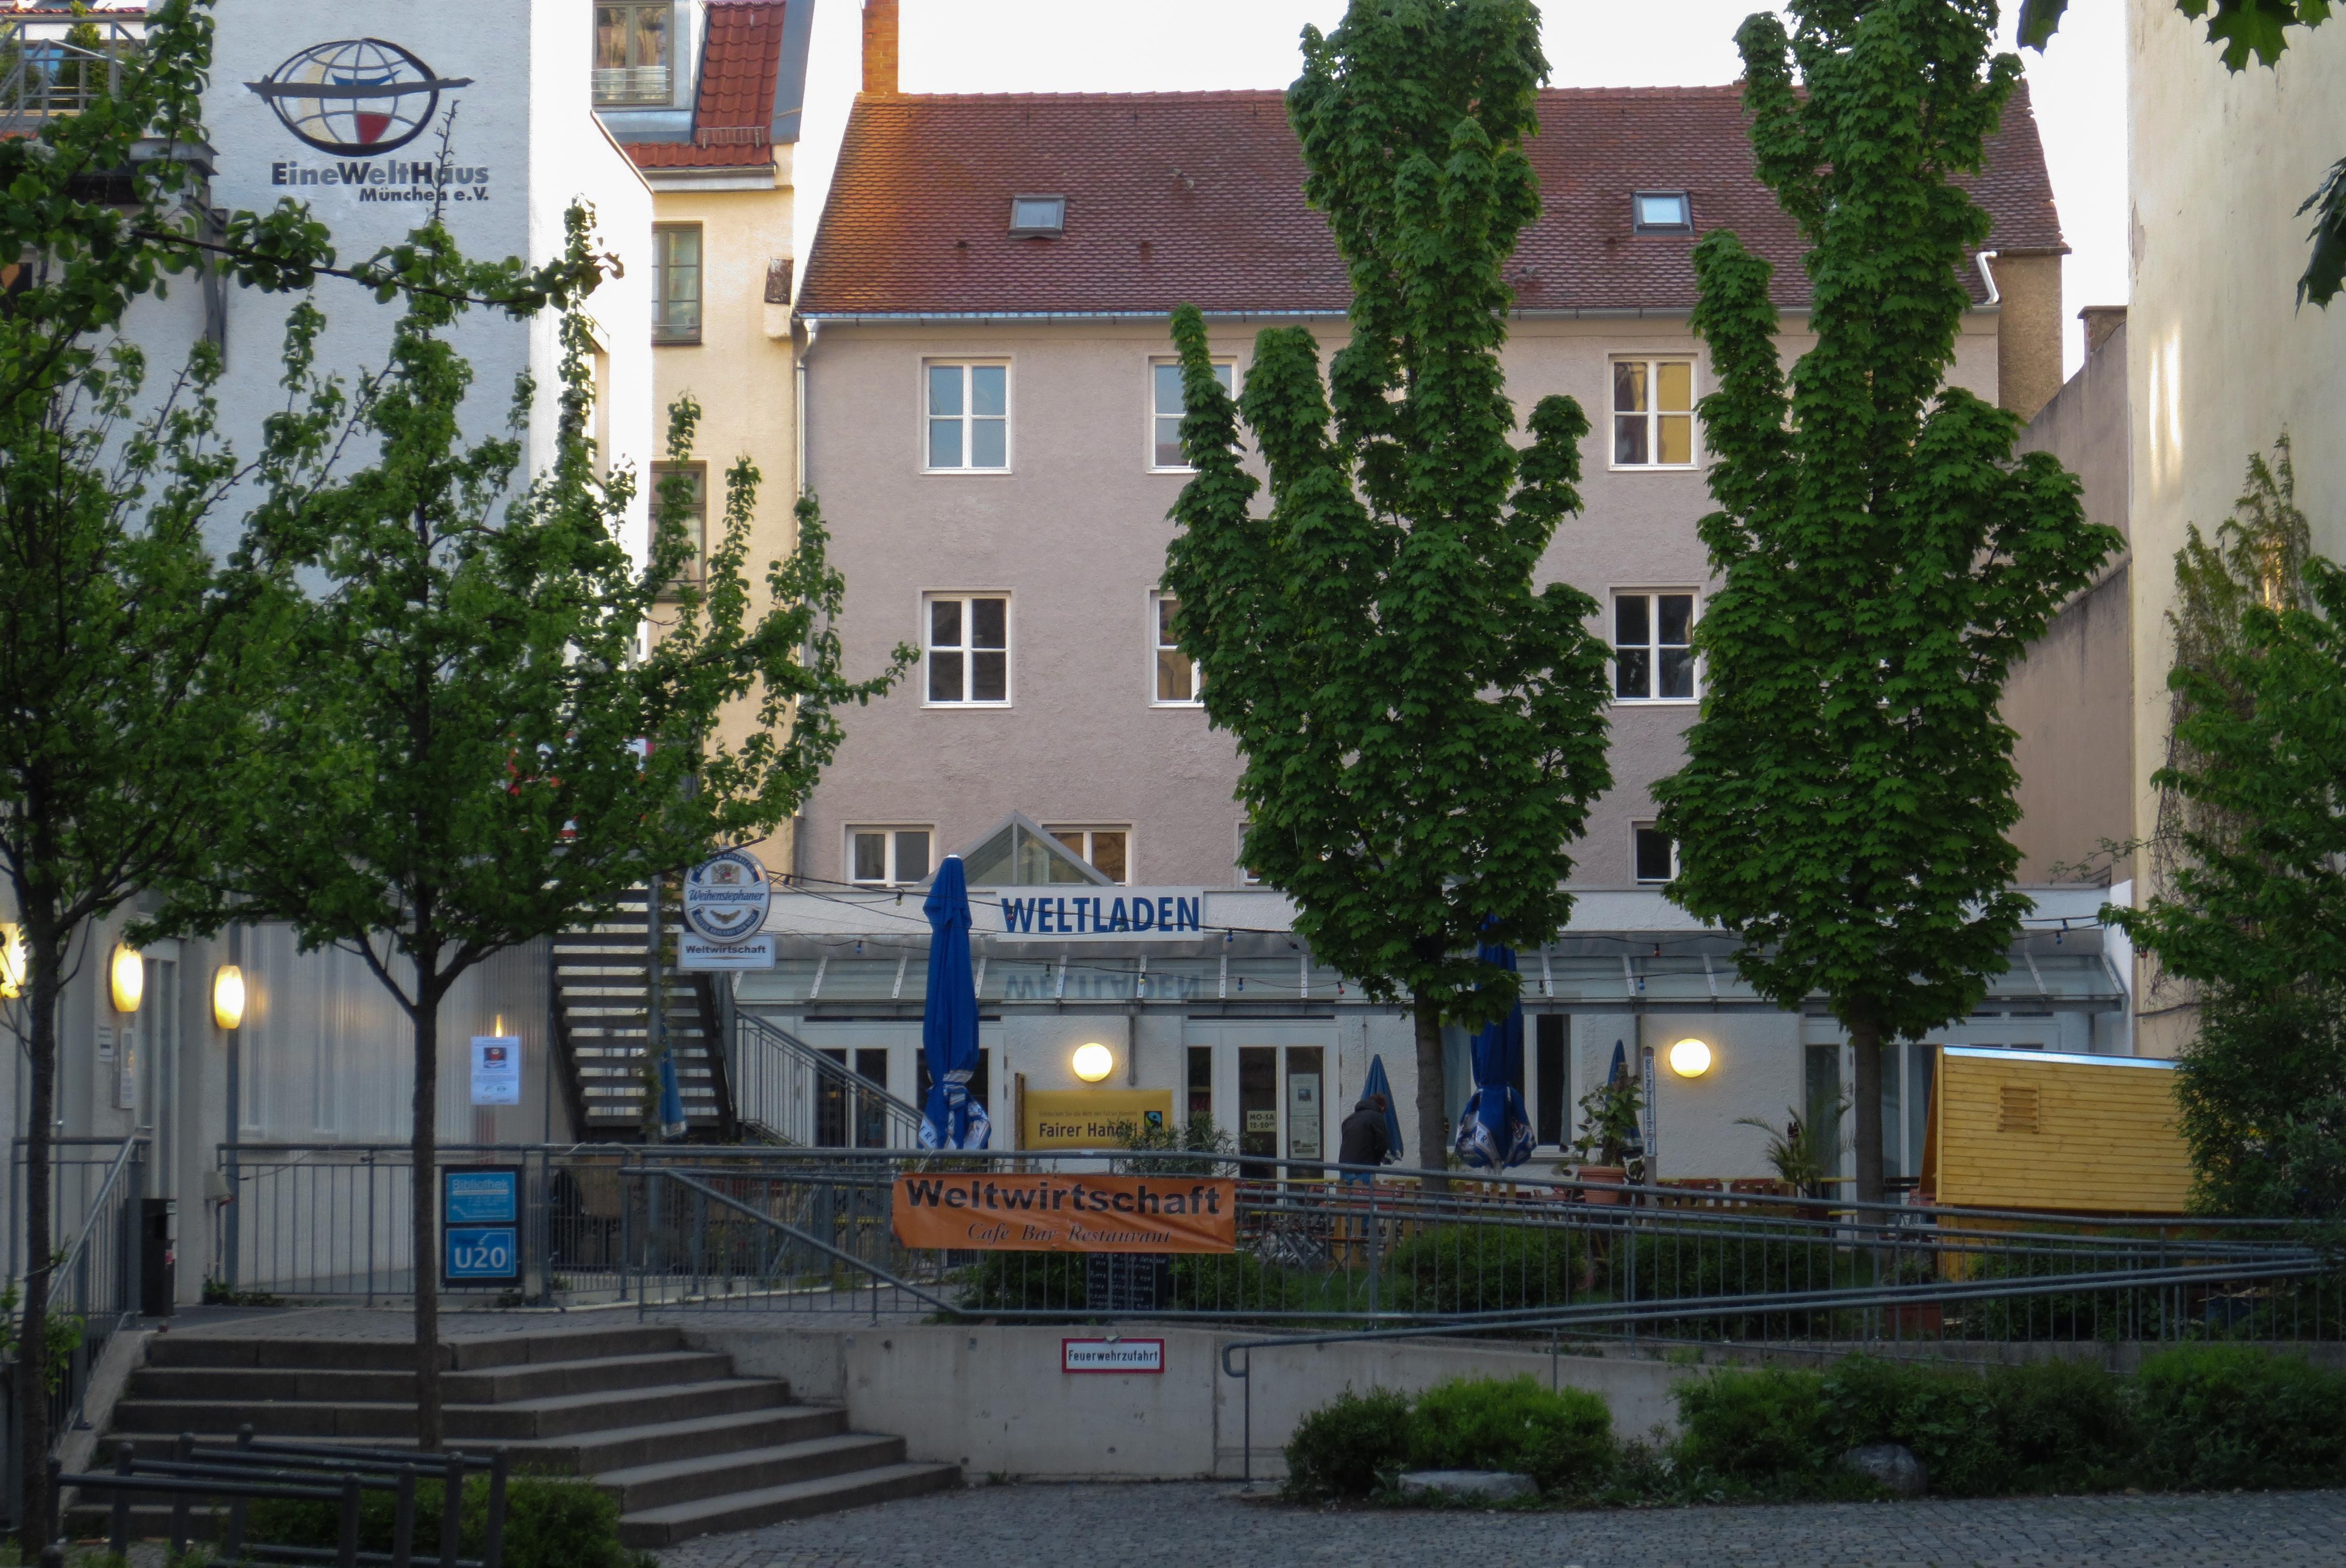 File:Eine Welt Haus München 009.jpg - Wikimedia Commons size: 4395 x 2938 post ID: 6 File size: 0 B